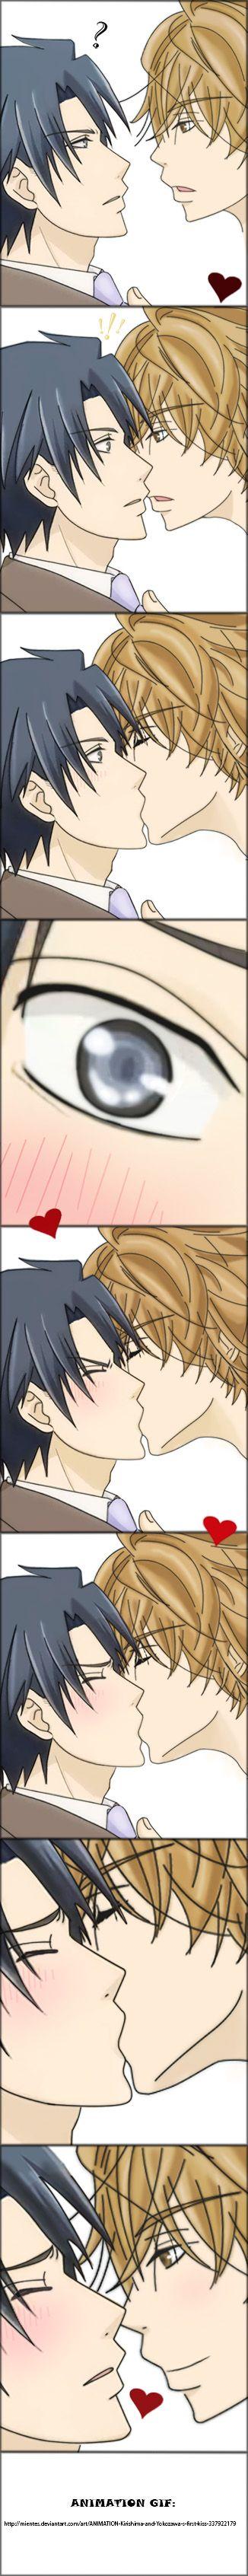 Meme kiss by MIENTES